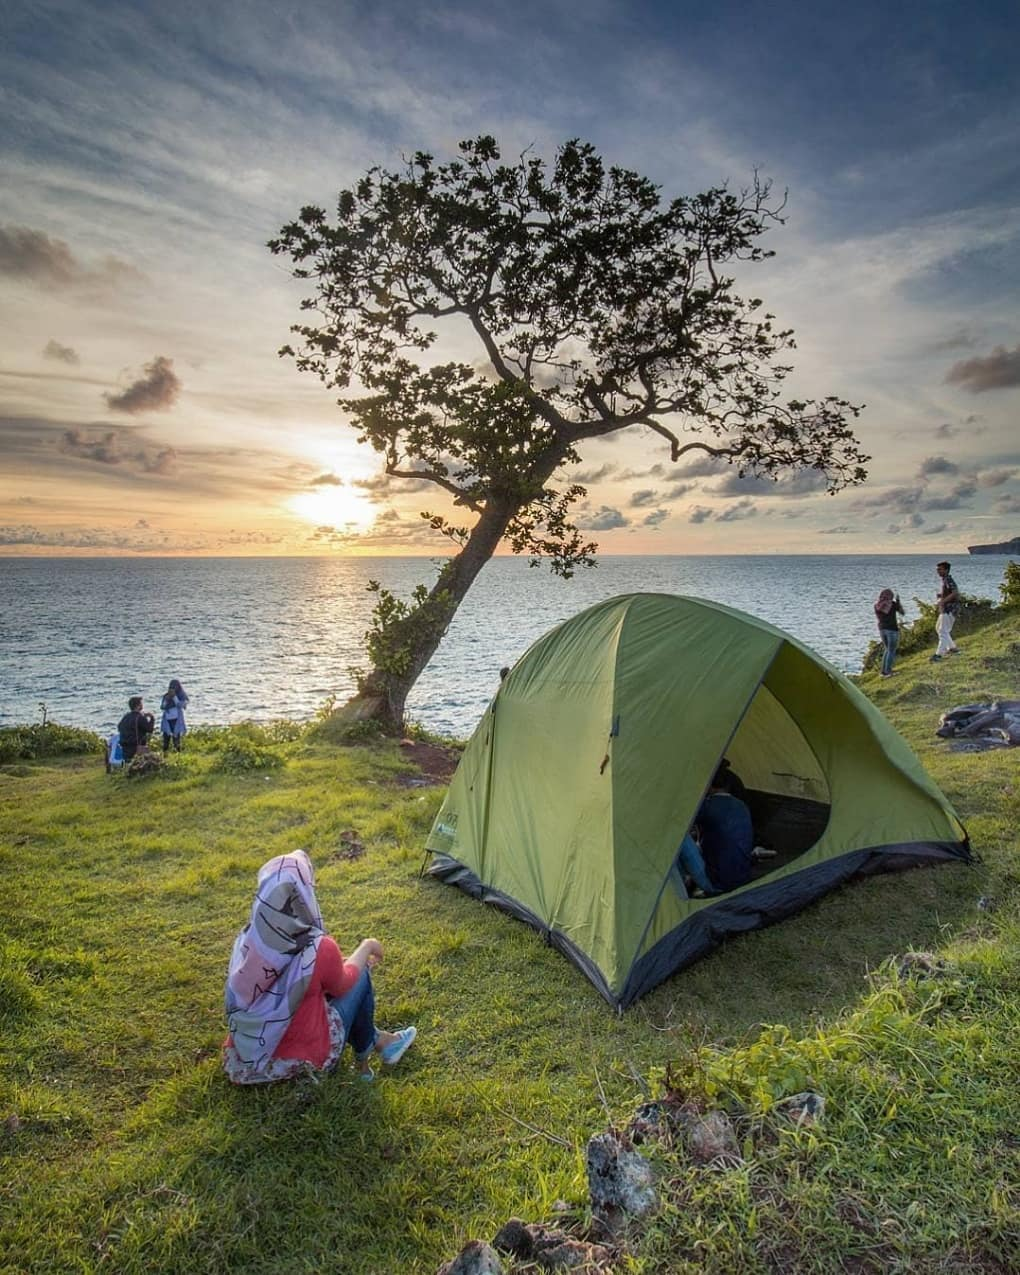 Keindahaan Pantai Kesirat di Gunung Kidul Yogyakarta